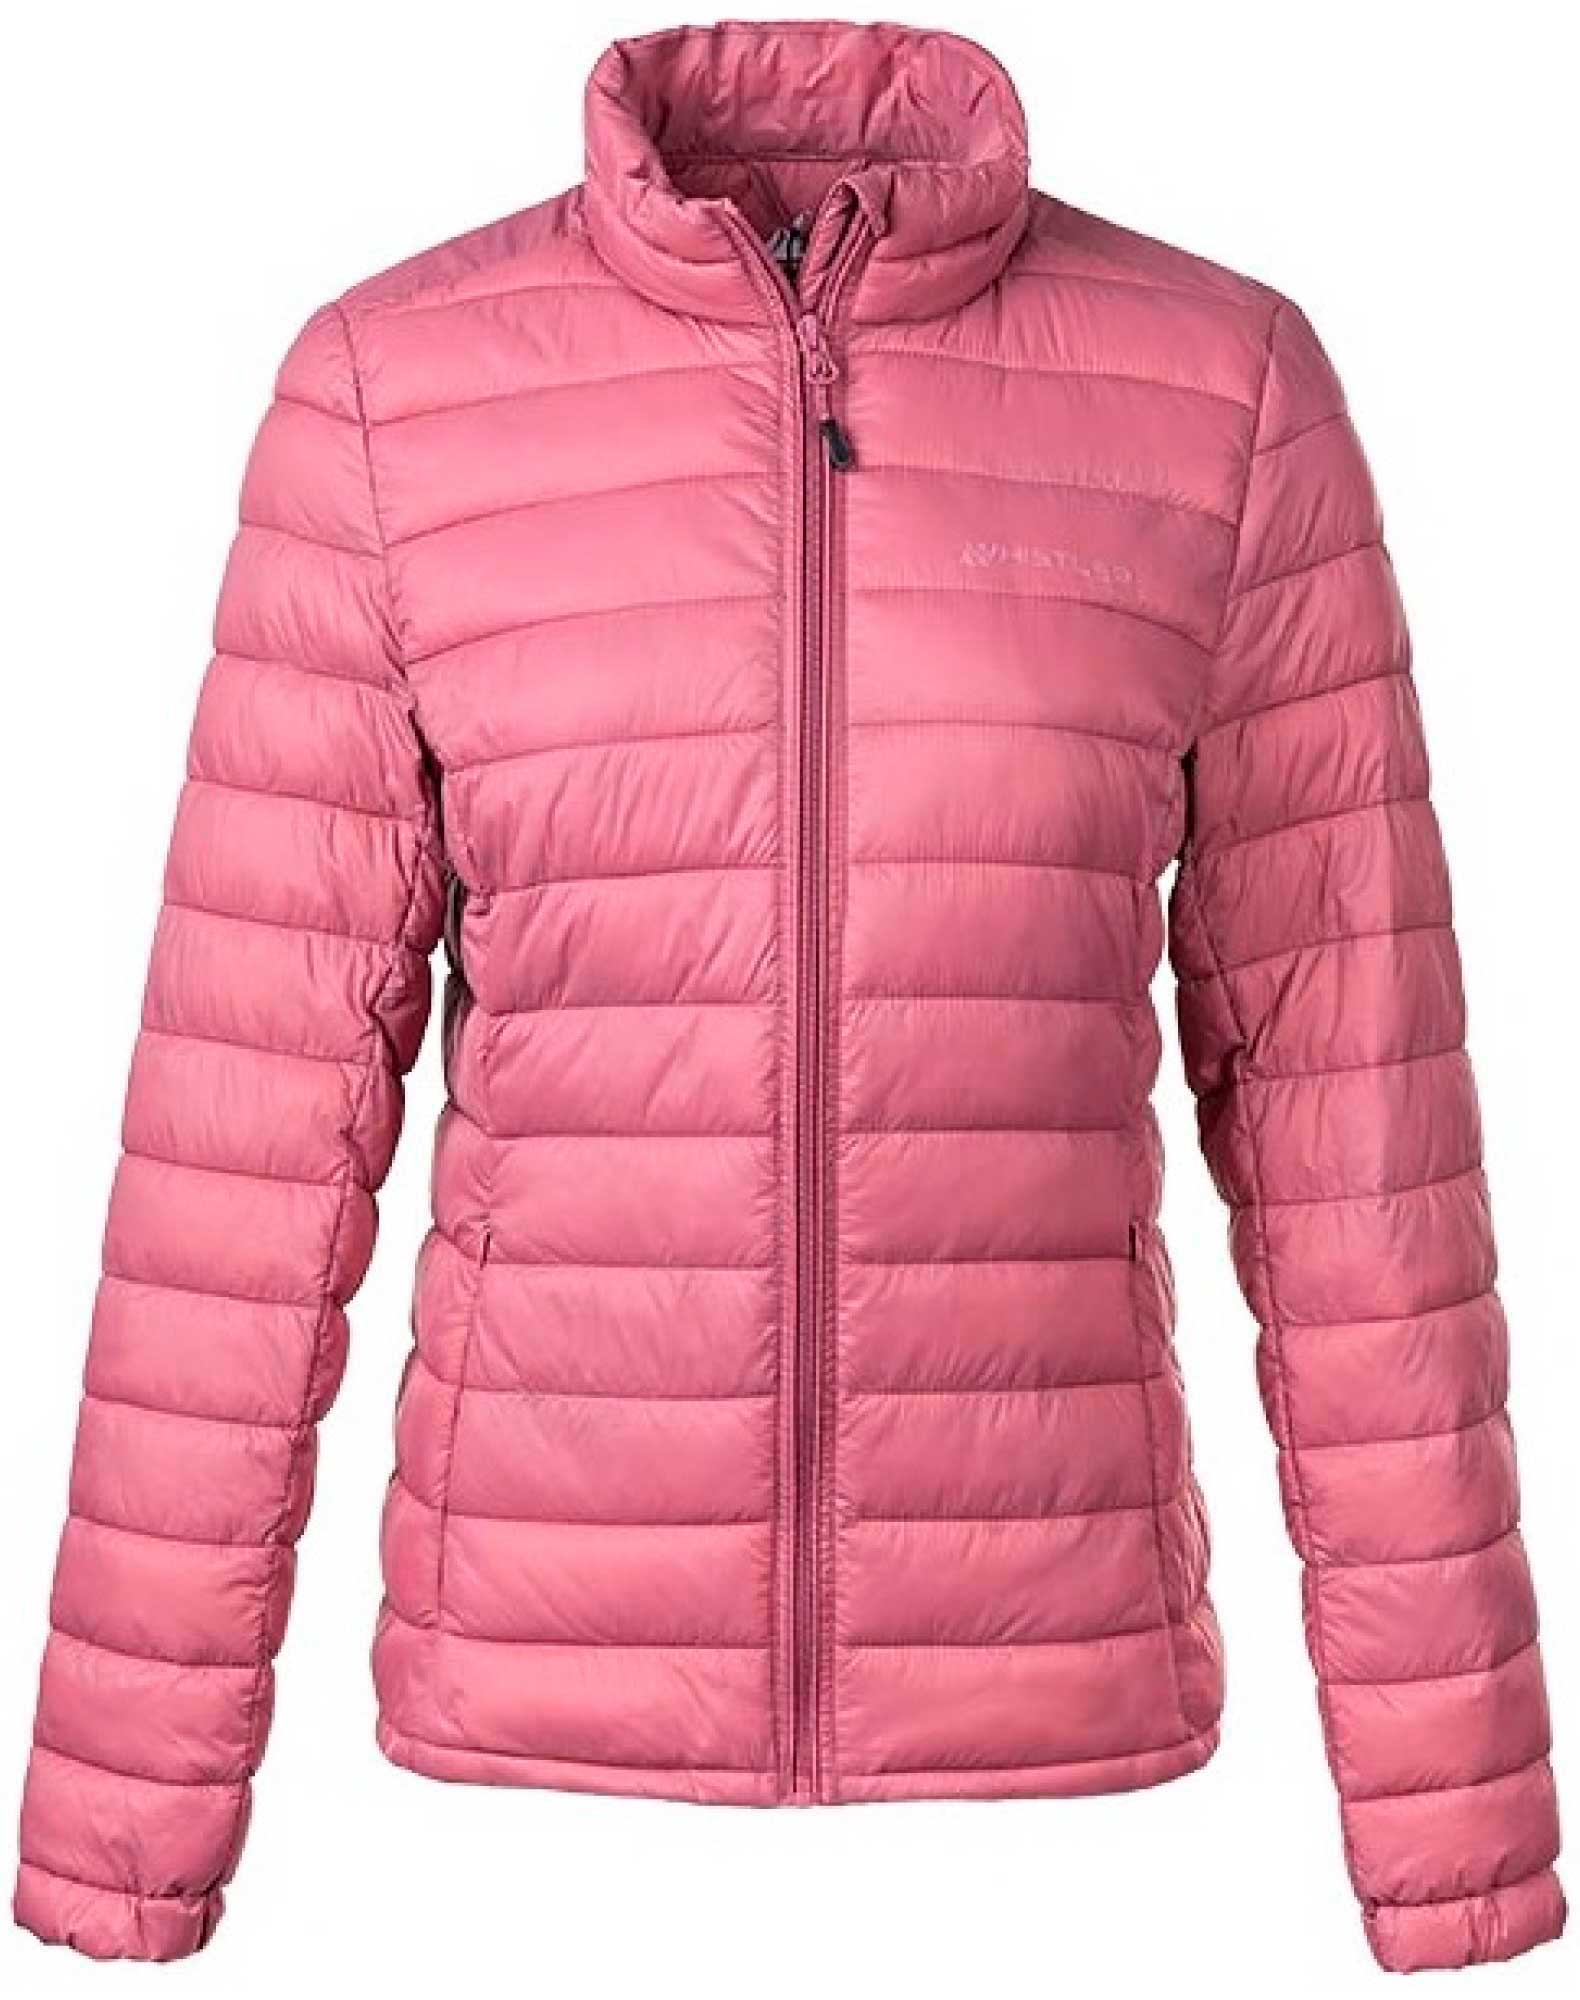 426331b8 Spar 401 kr. Tilbud på Whistler Tepic W Pro-Lite jakke